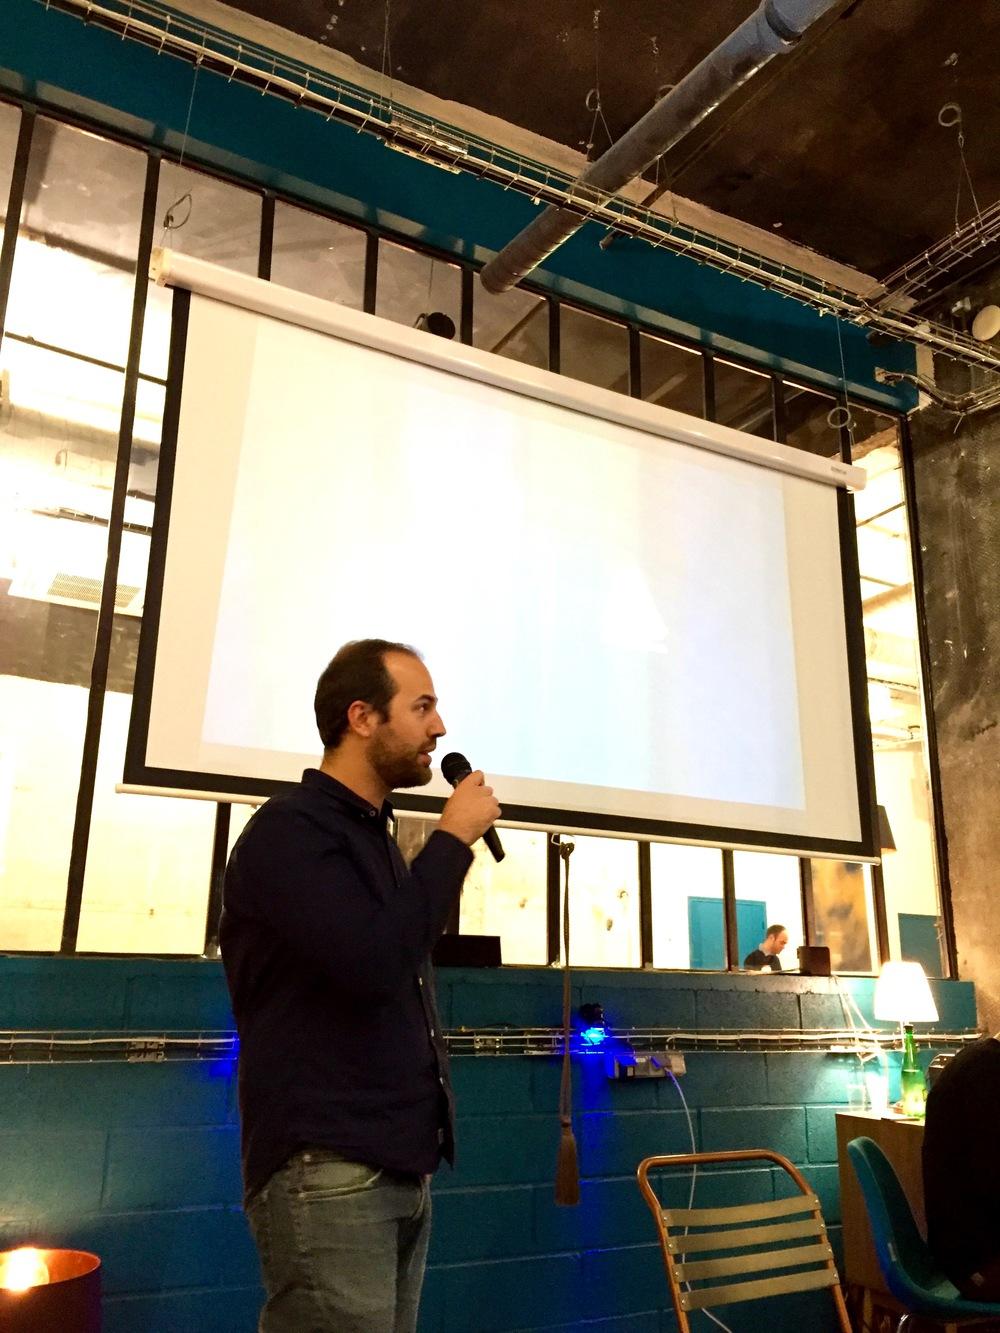 startups-calling-stringcan-interactive-remix-coworking-paris-2.jpg